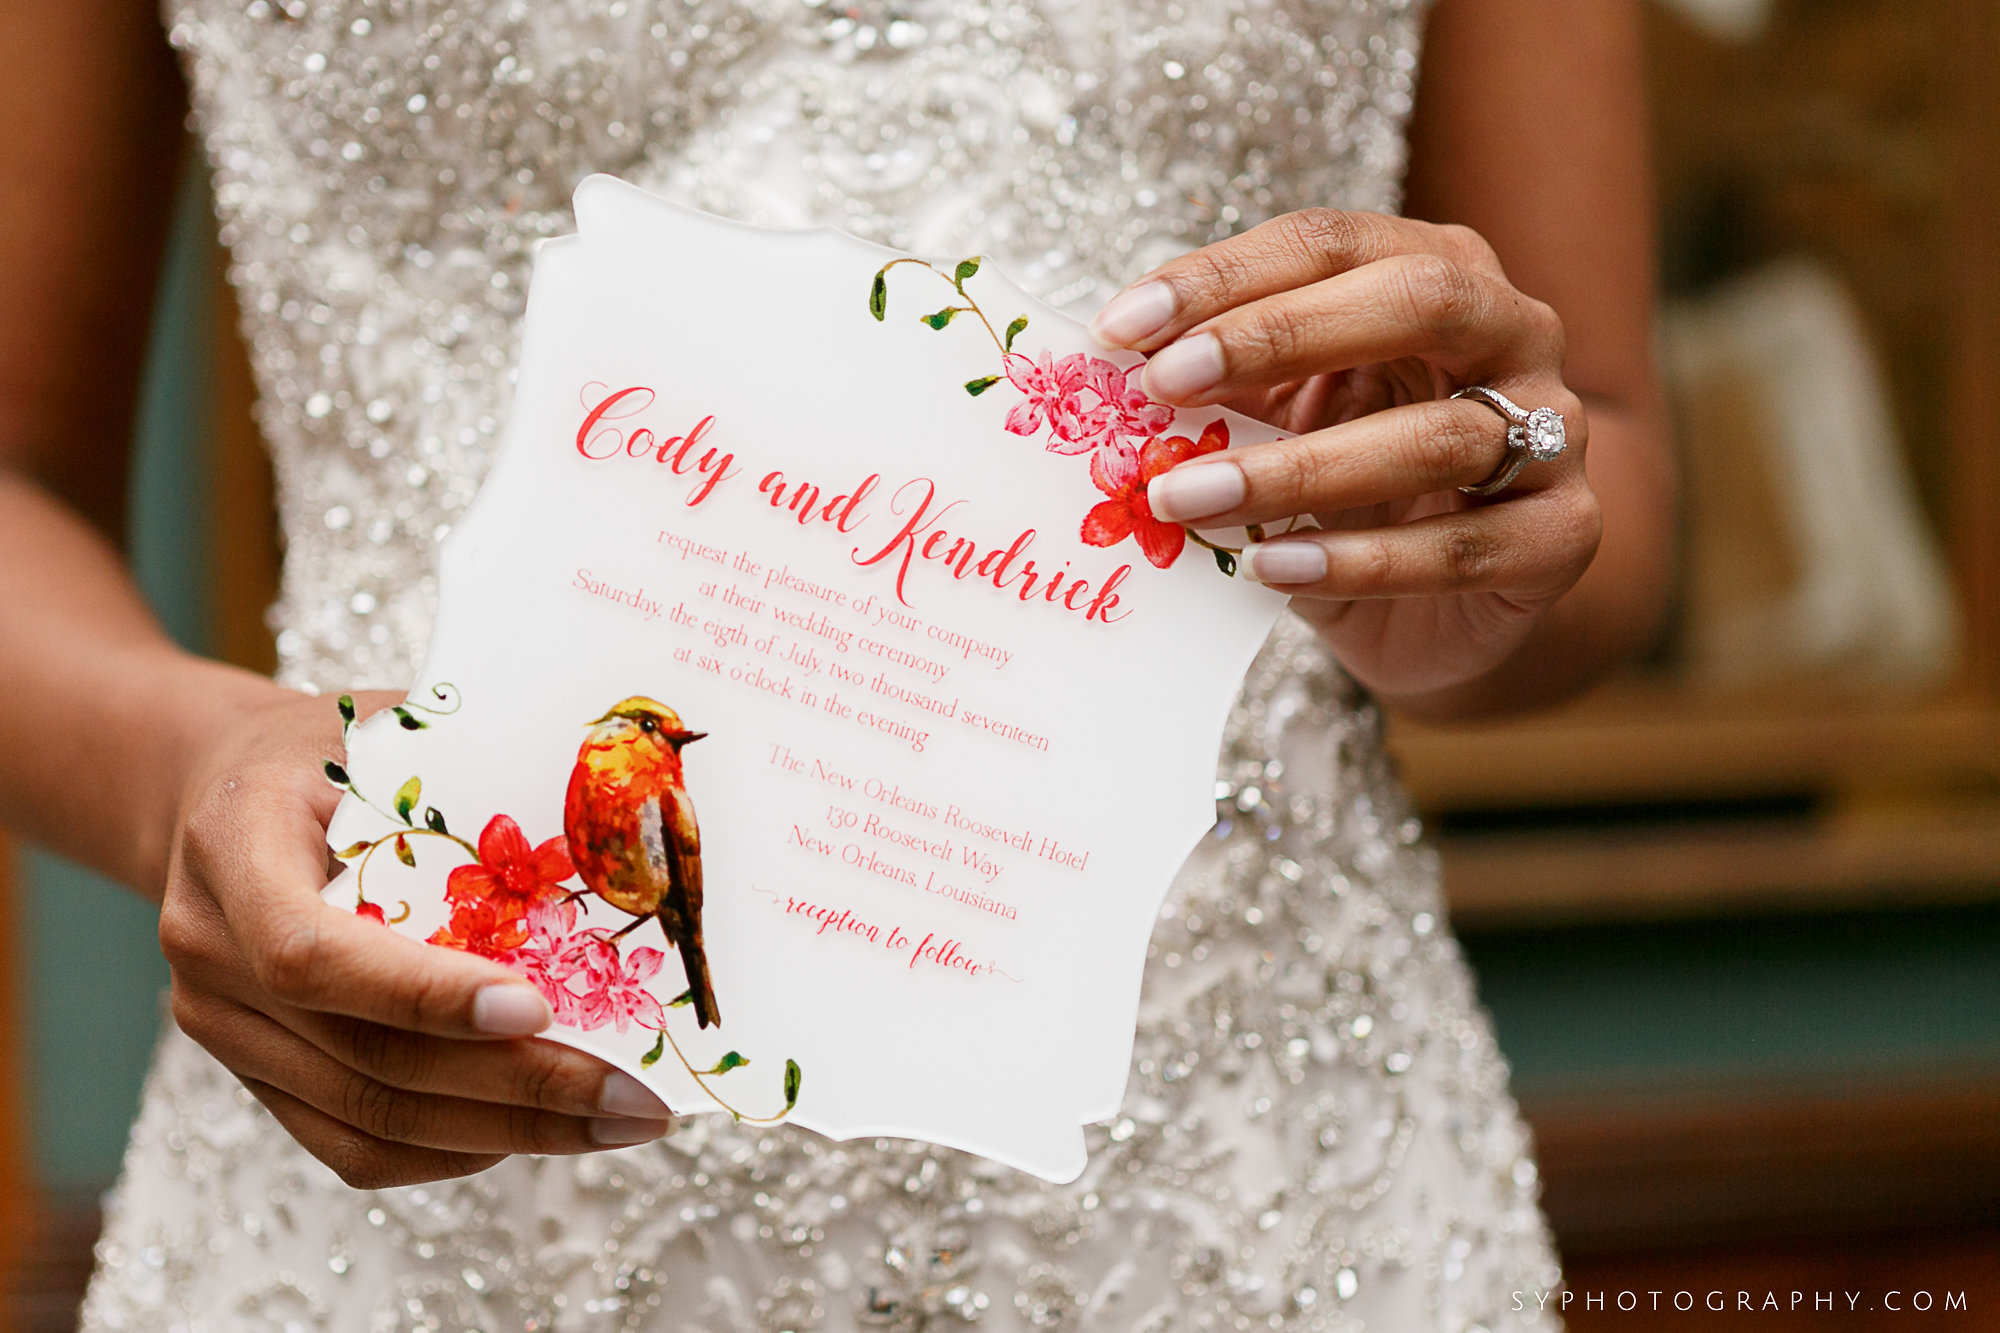 07 PAFA Spring Wedding Orange Pink Acrylic Invitation Philadelphia Wedding Designer.jpg